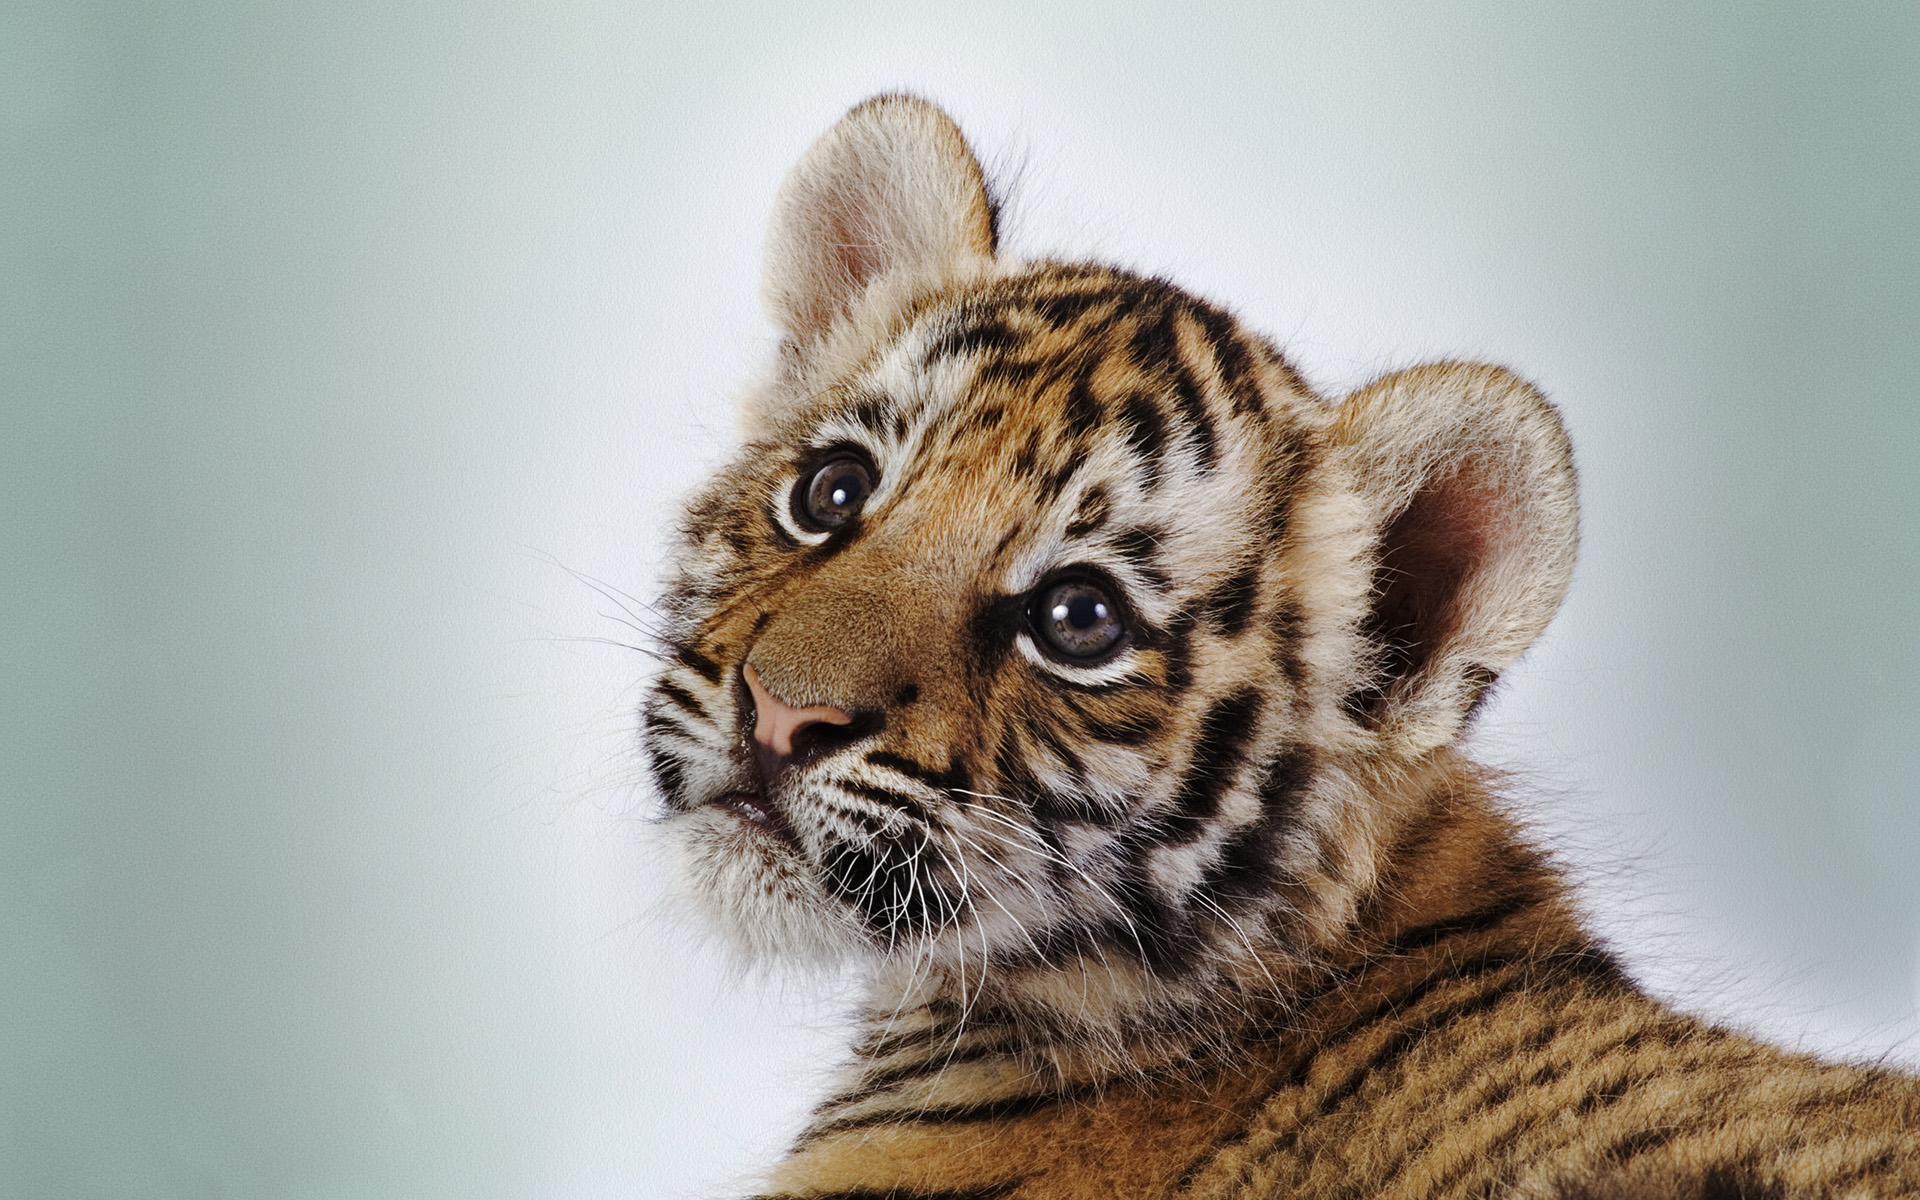 Cute Tiger Cub Wallpapers HD Wallpapers 1920x1200